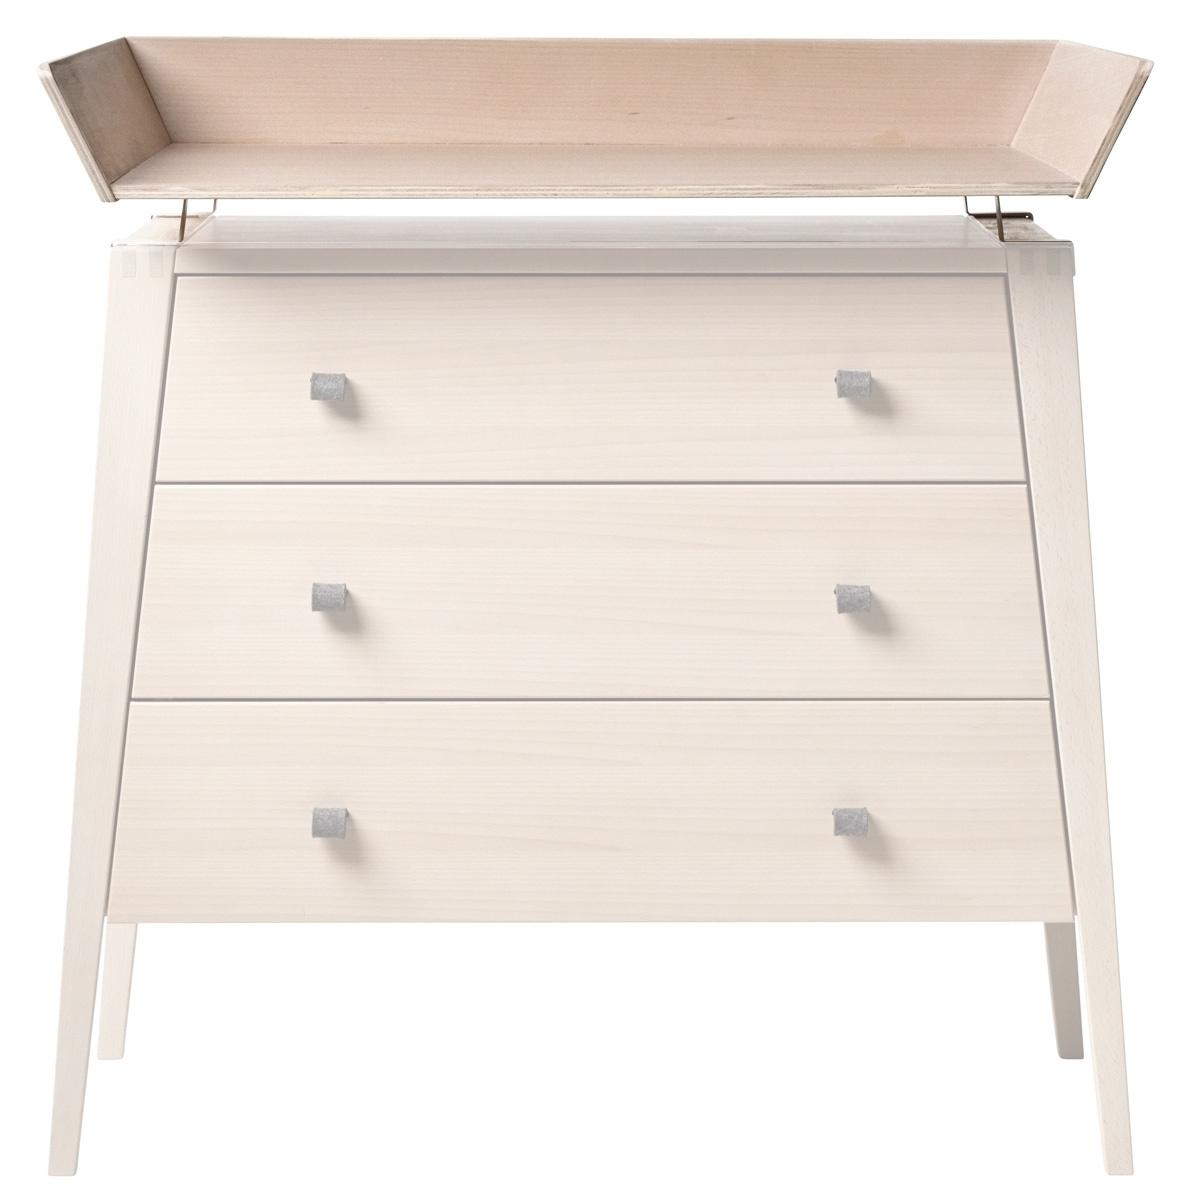 leander plan langer linea h tre table langer leander sur l 39 armoire de b b. Black Bedroom Furniture Sets. Home Design Ideas